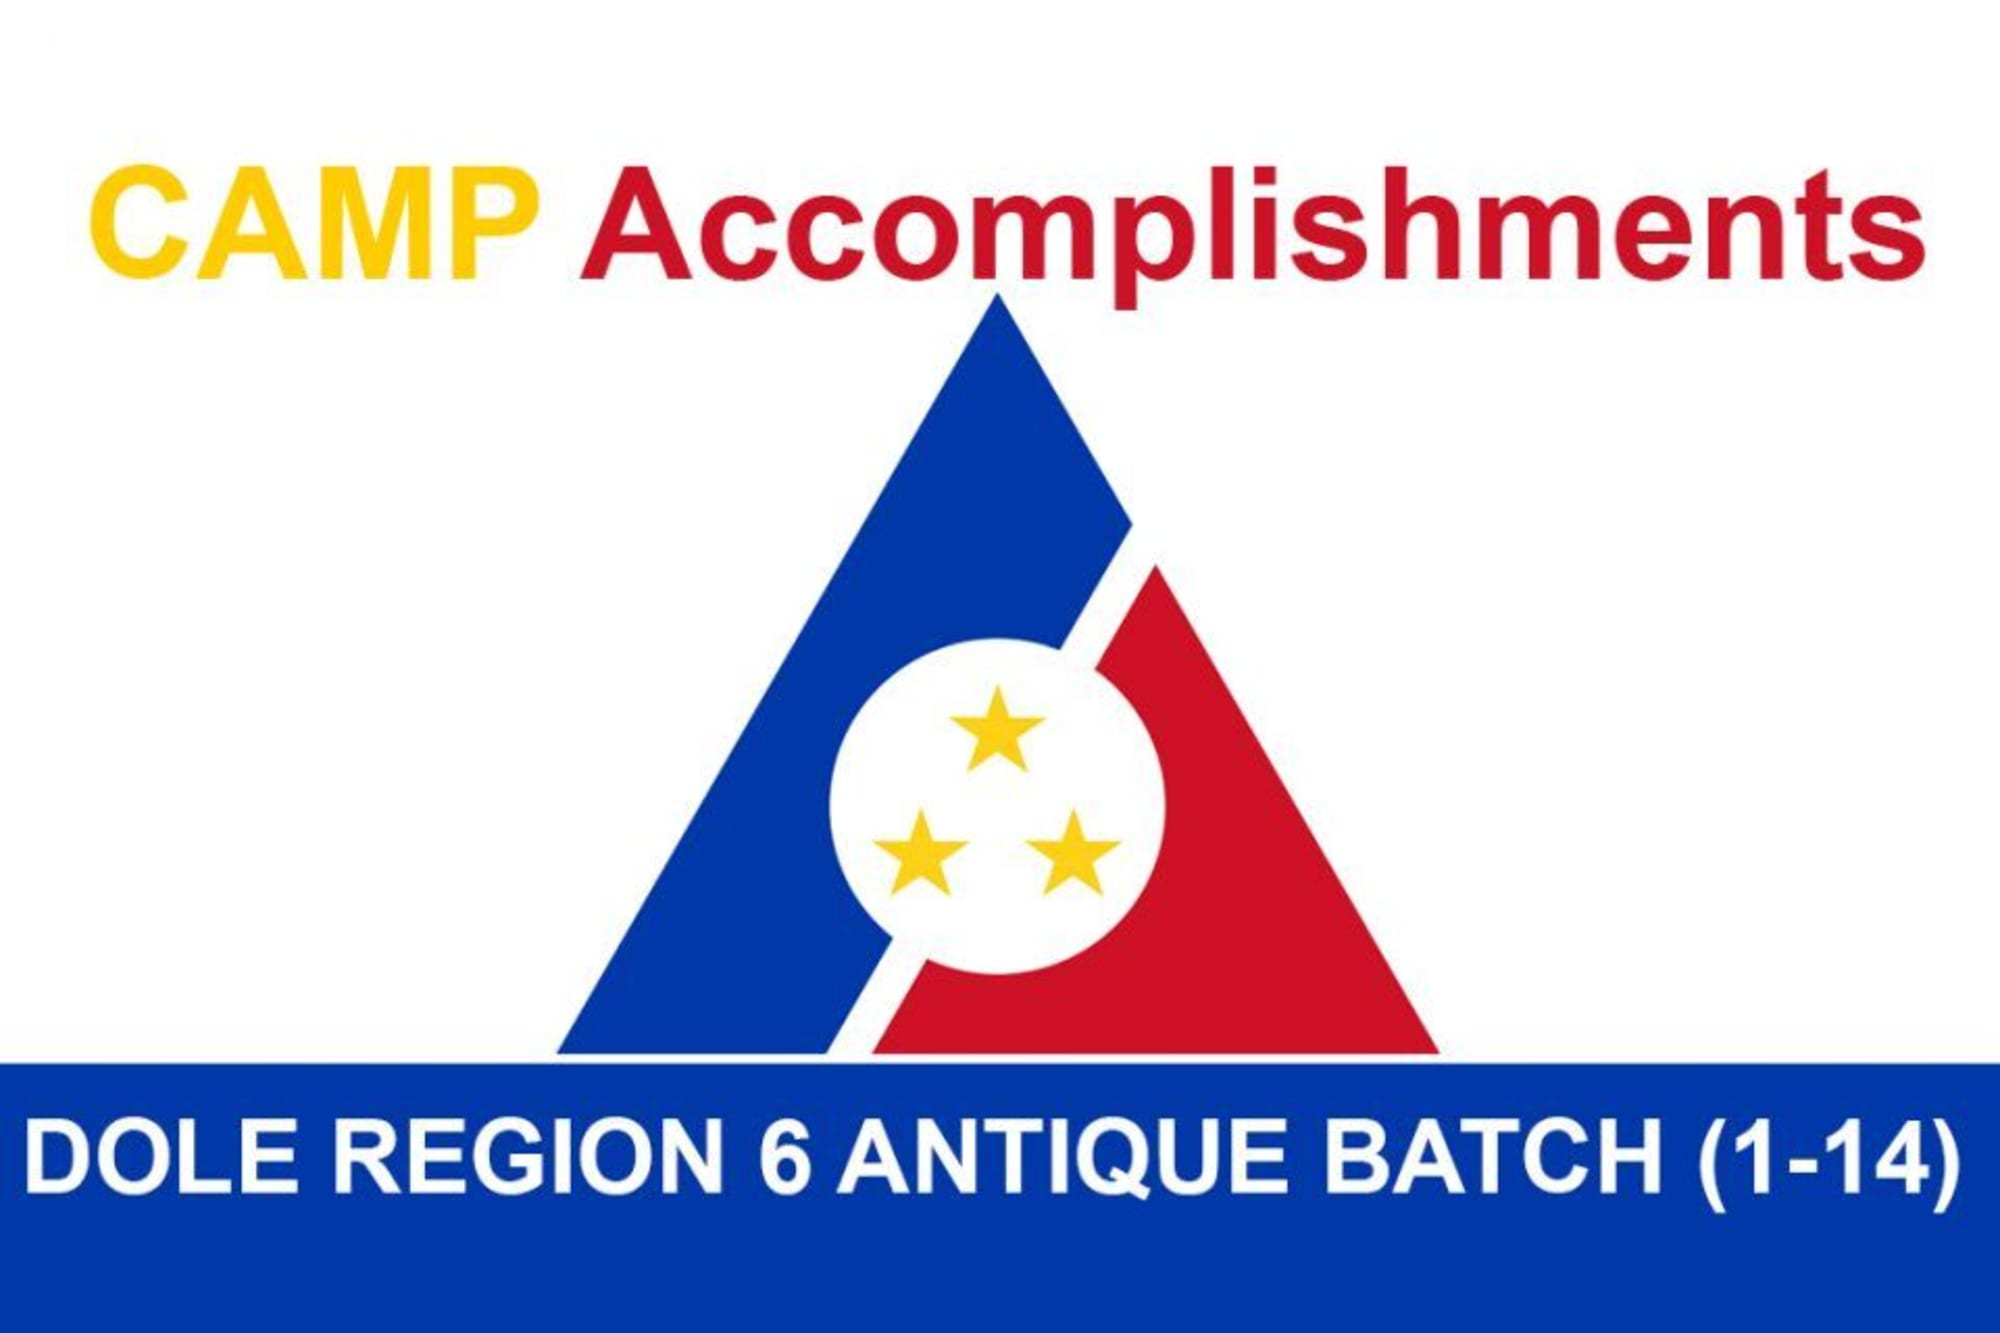 DOLE REGION 6 CAMP Antique – Accomplishments Batch (1-14); Alphabetical Order of list of companies